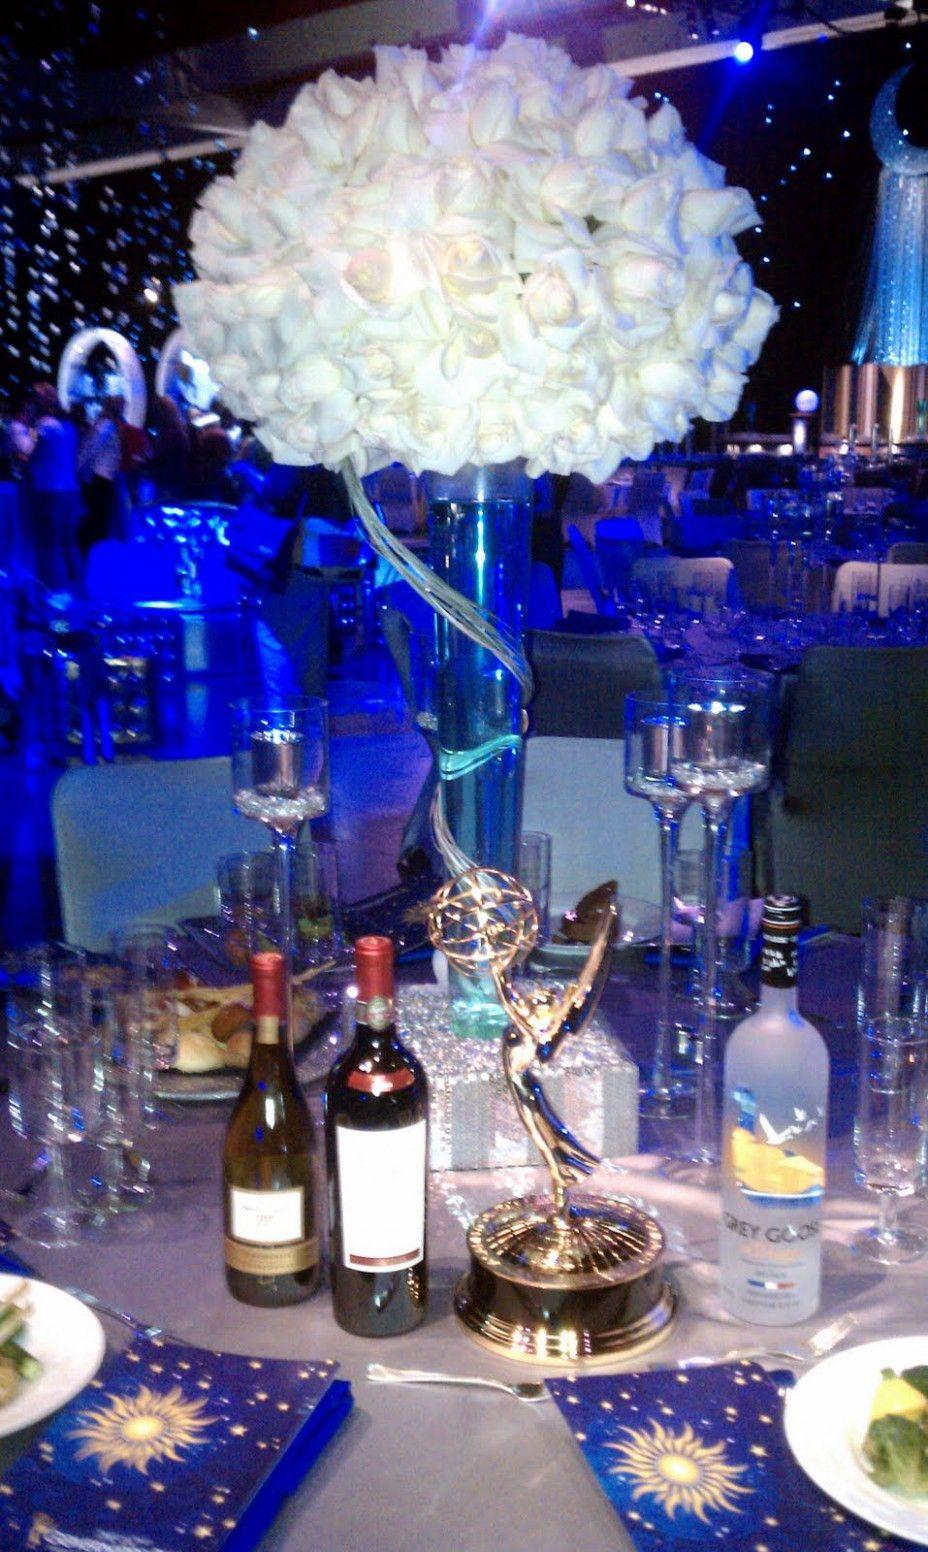 Wedding reception wedding decorations 2018  Starry Night Wedding Reception Tall Centerpiece in   Wedding